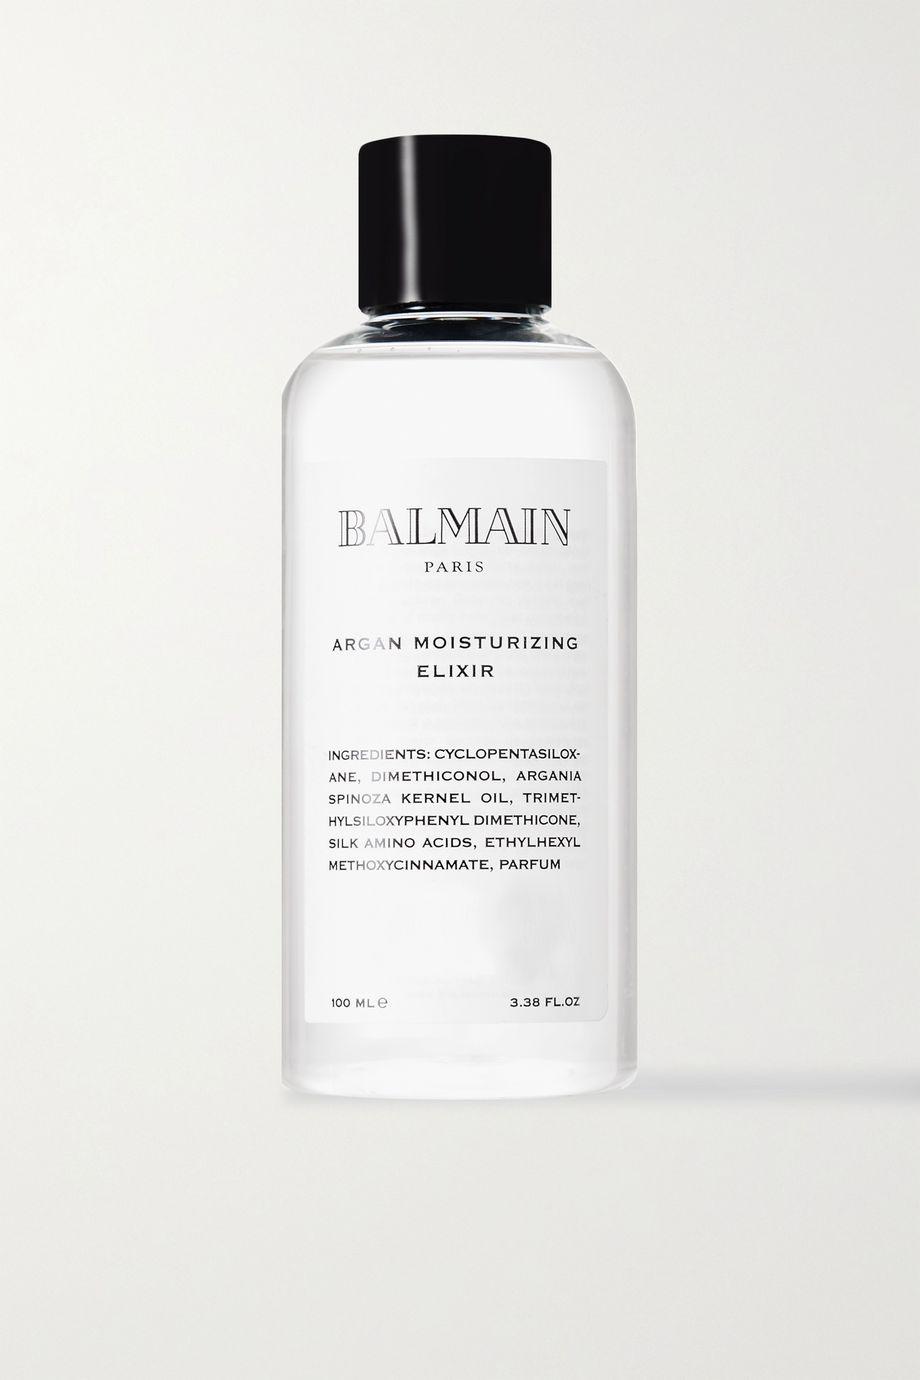 Balmain Paris Hair Couture Argan Moisturizing Elixir, 100ml